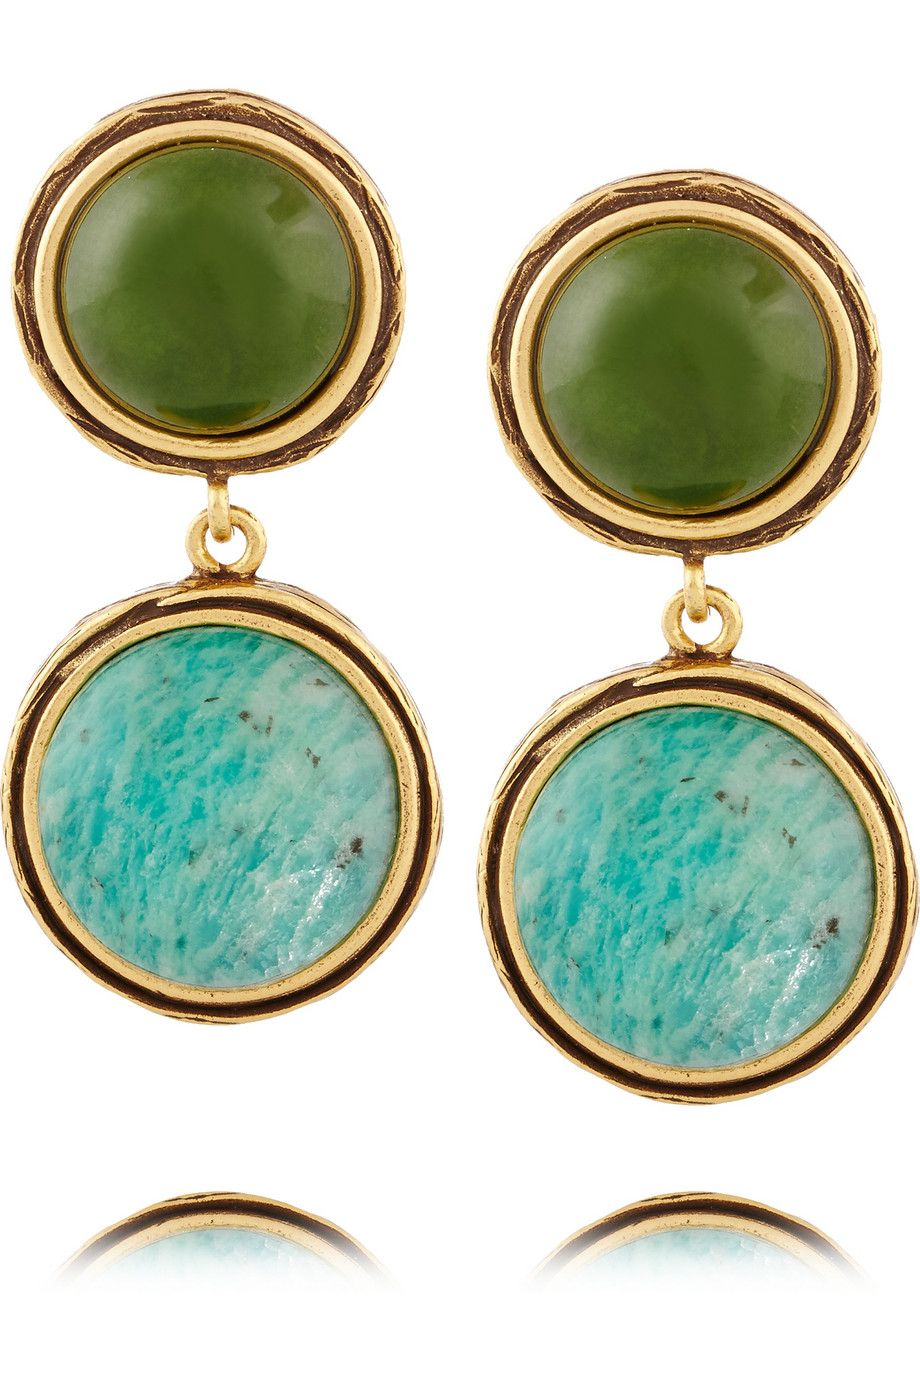 Oscar de la RentaGold-plated cabochon earrings